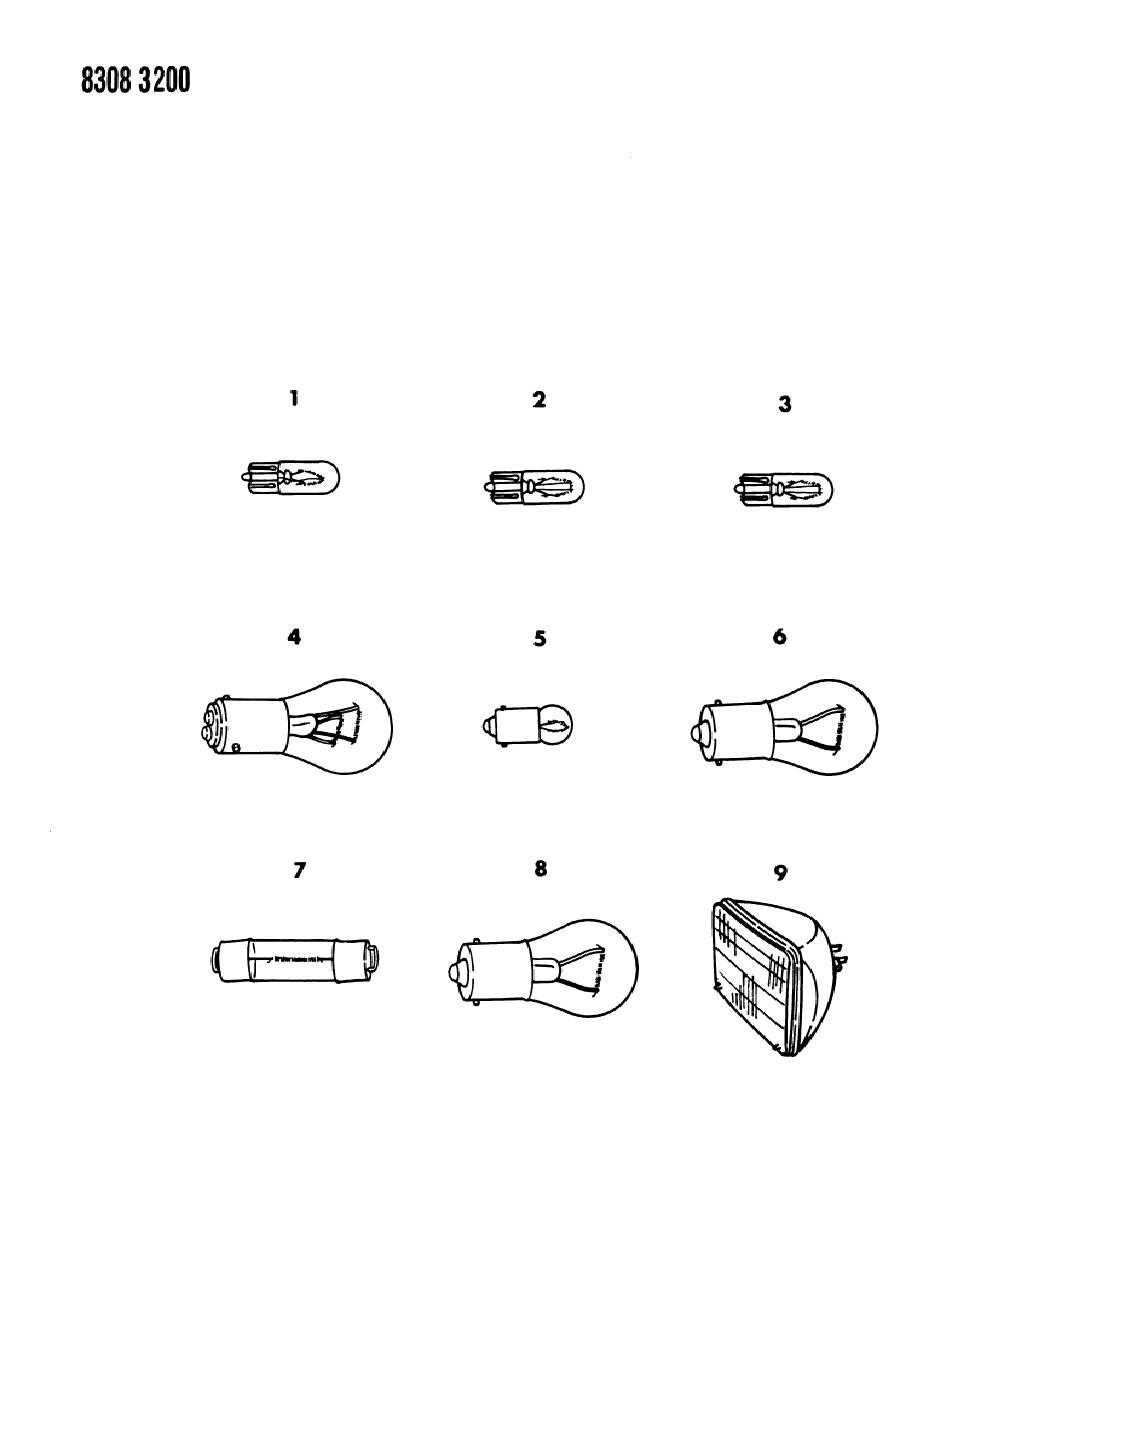 1989 Dodge Ramcharger Bulb Cross Reference